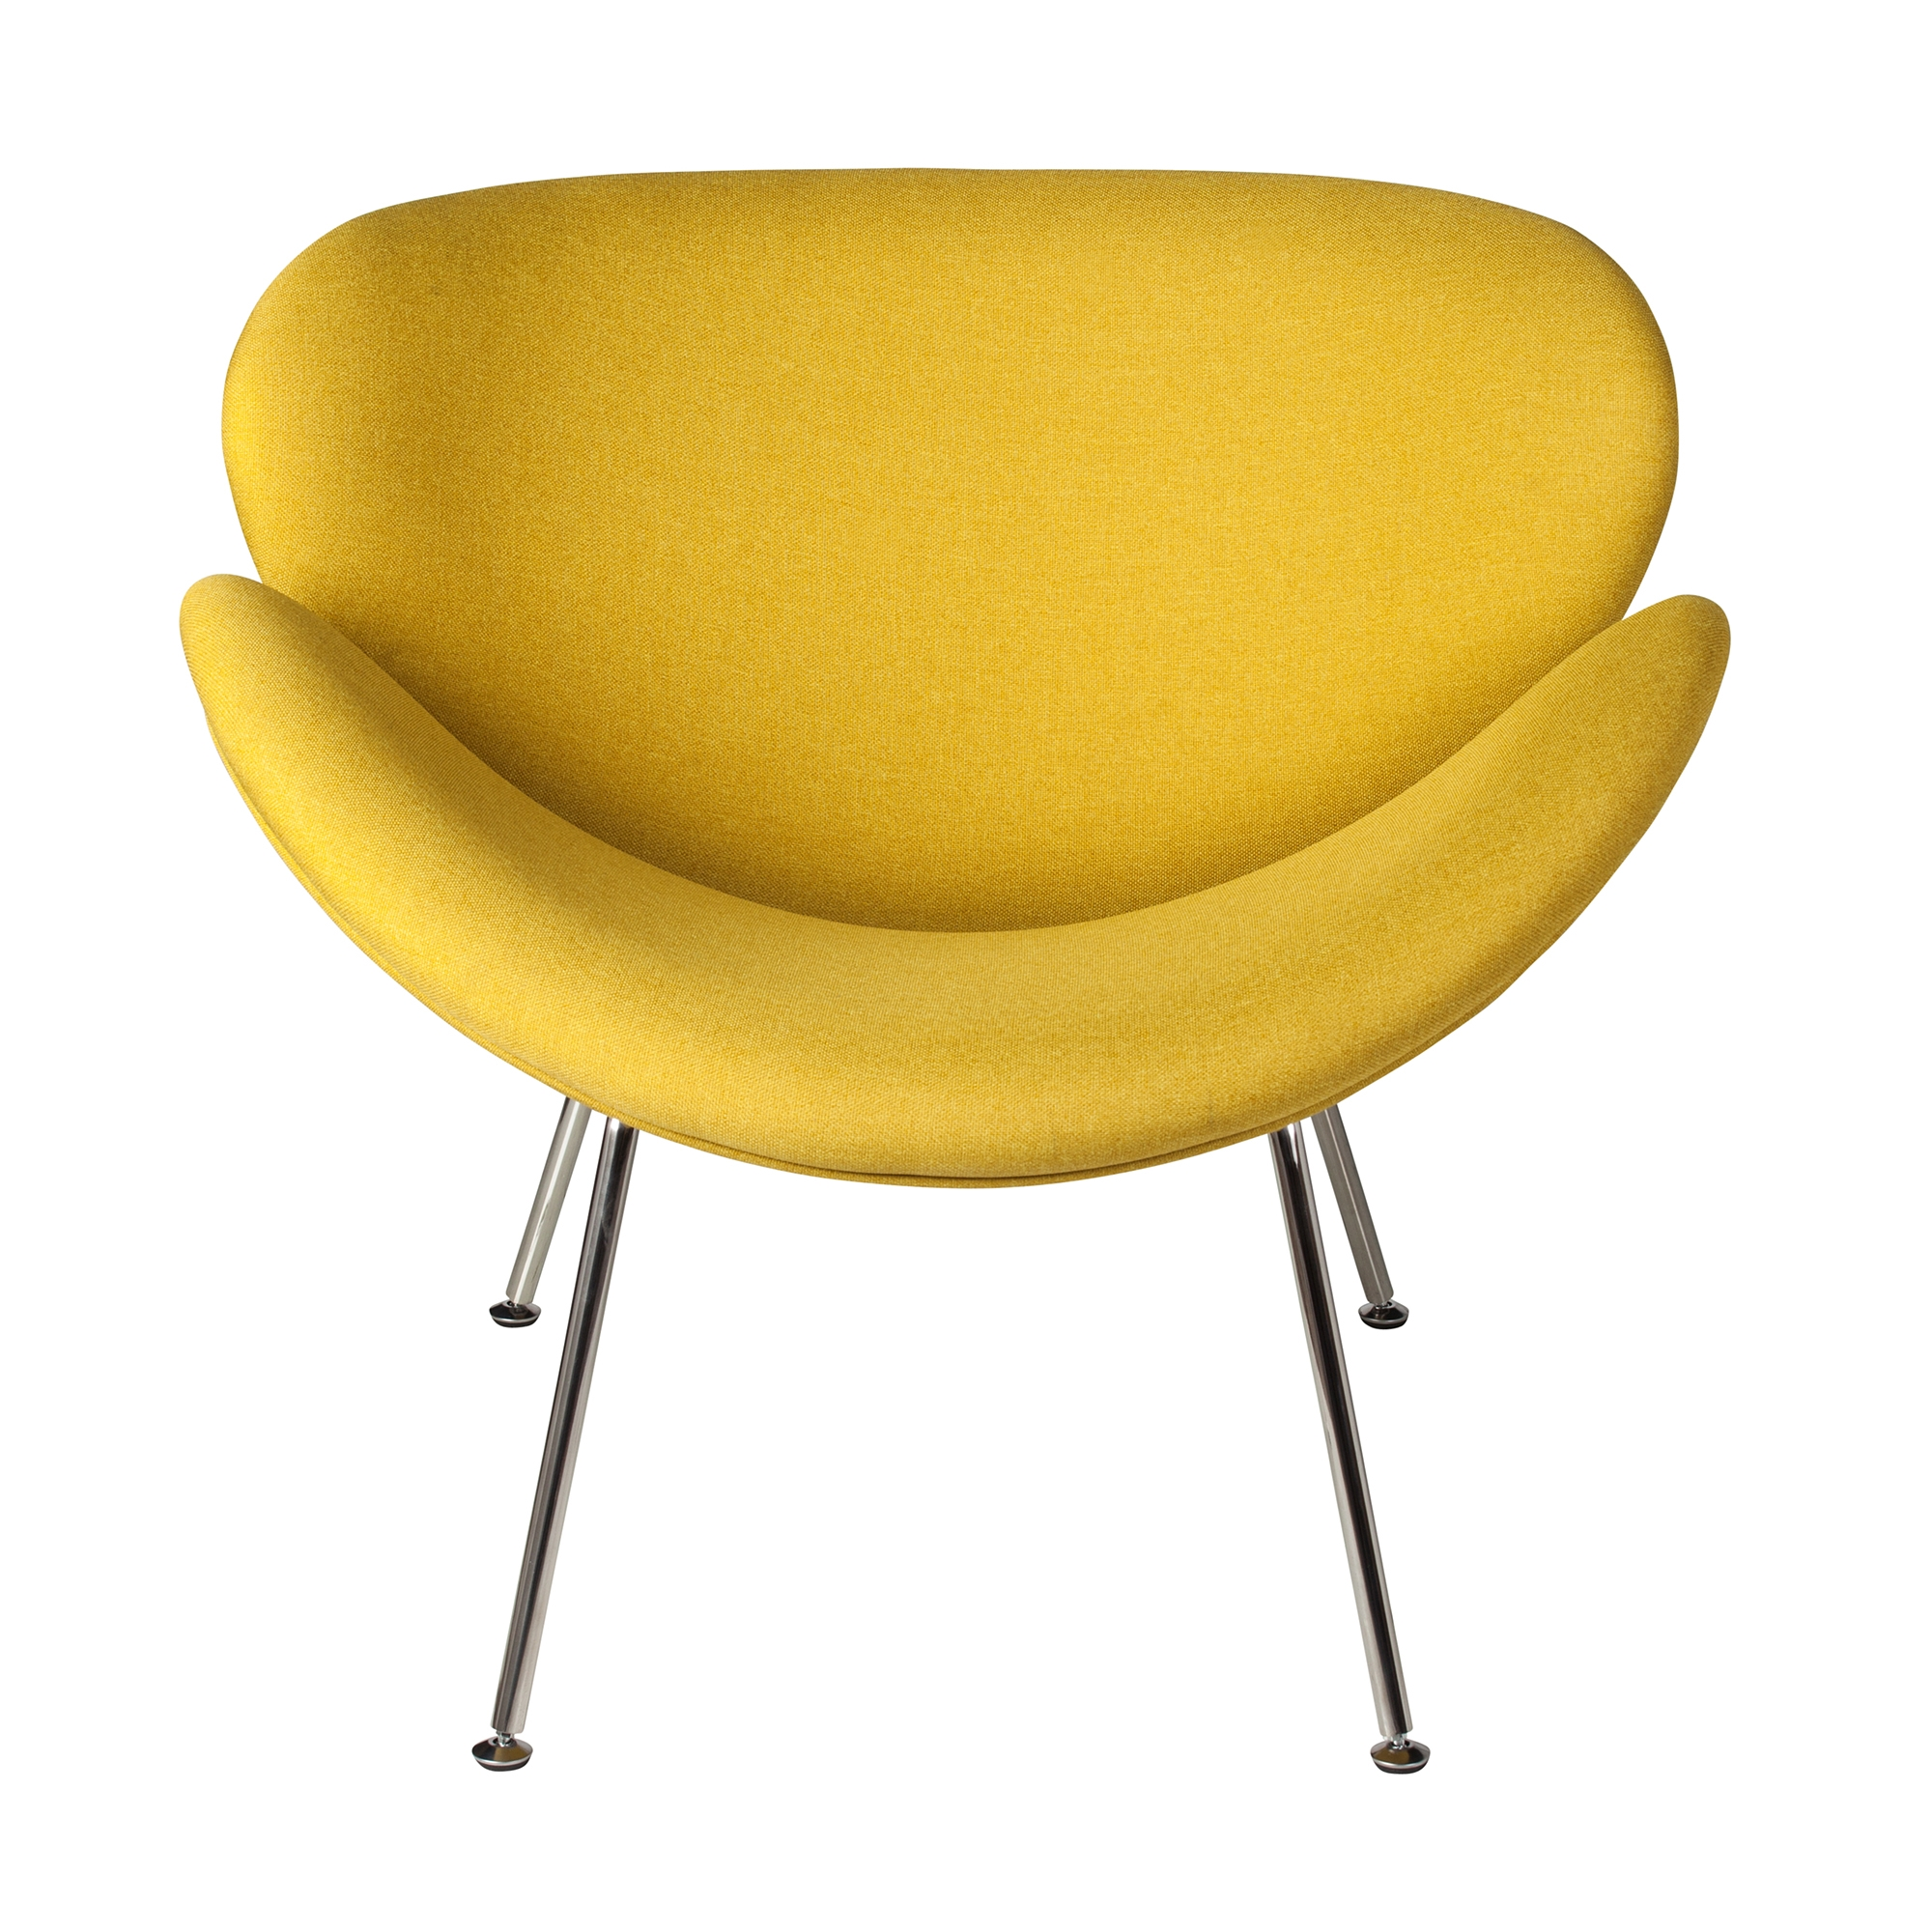 Genial Orange Slice Chair In Yellow